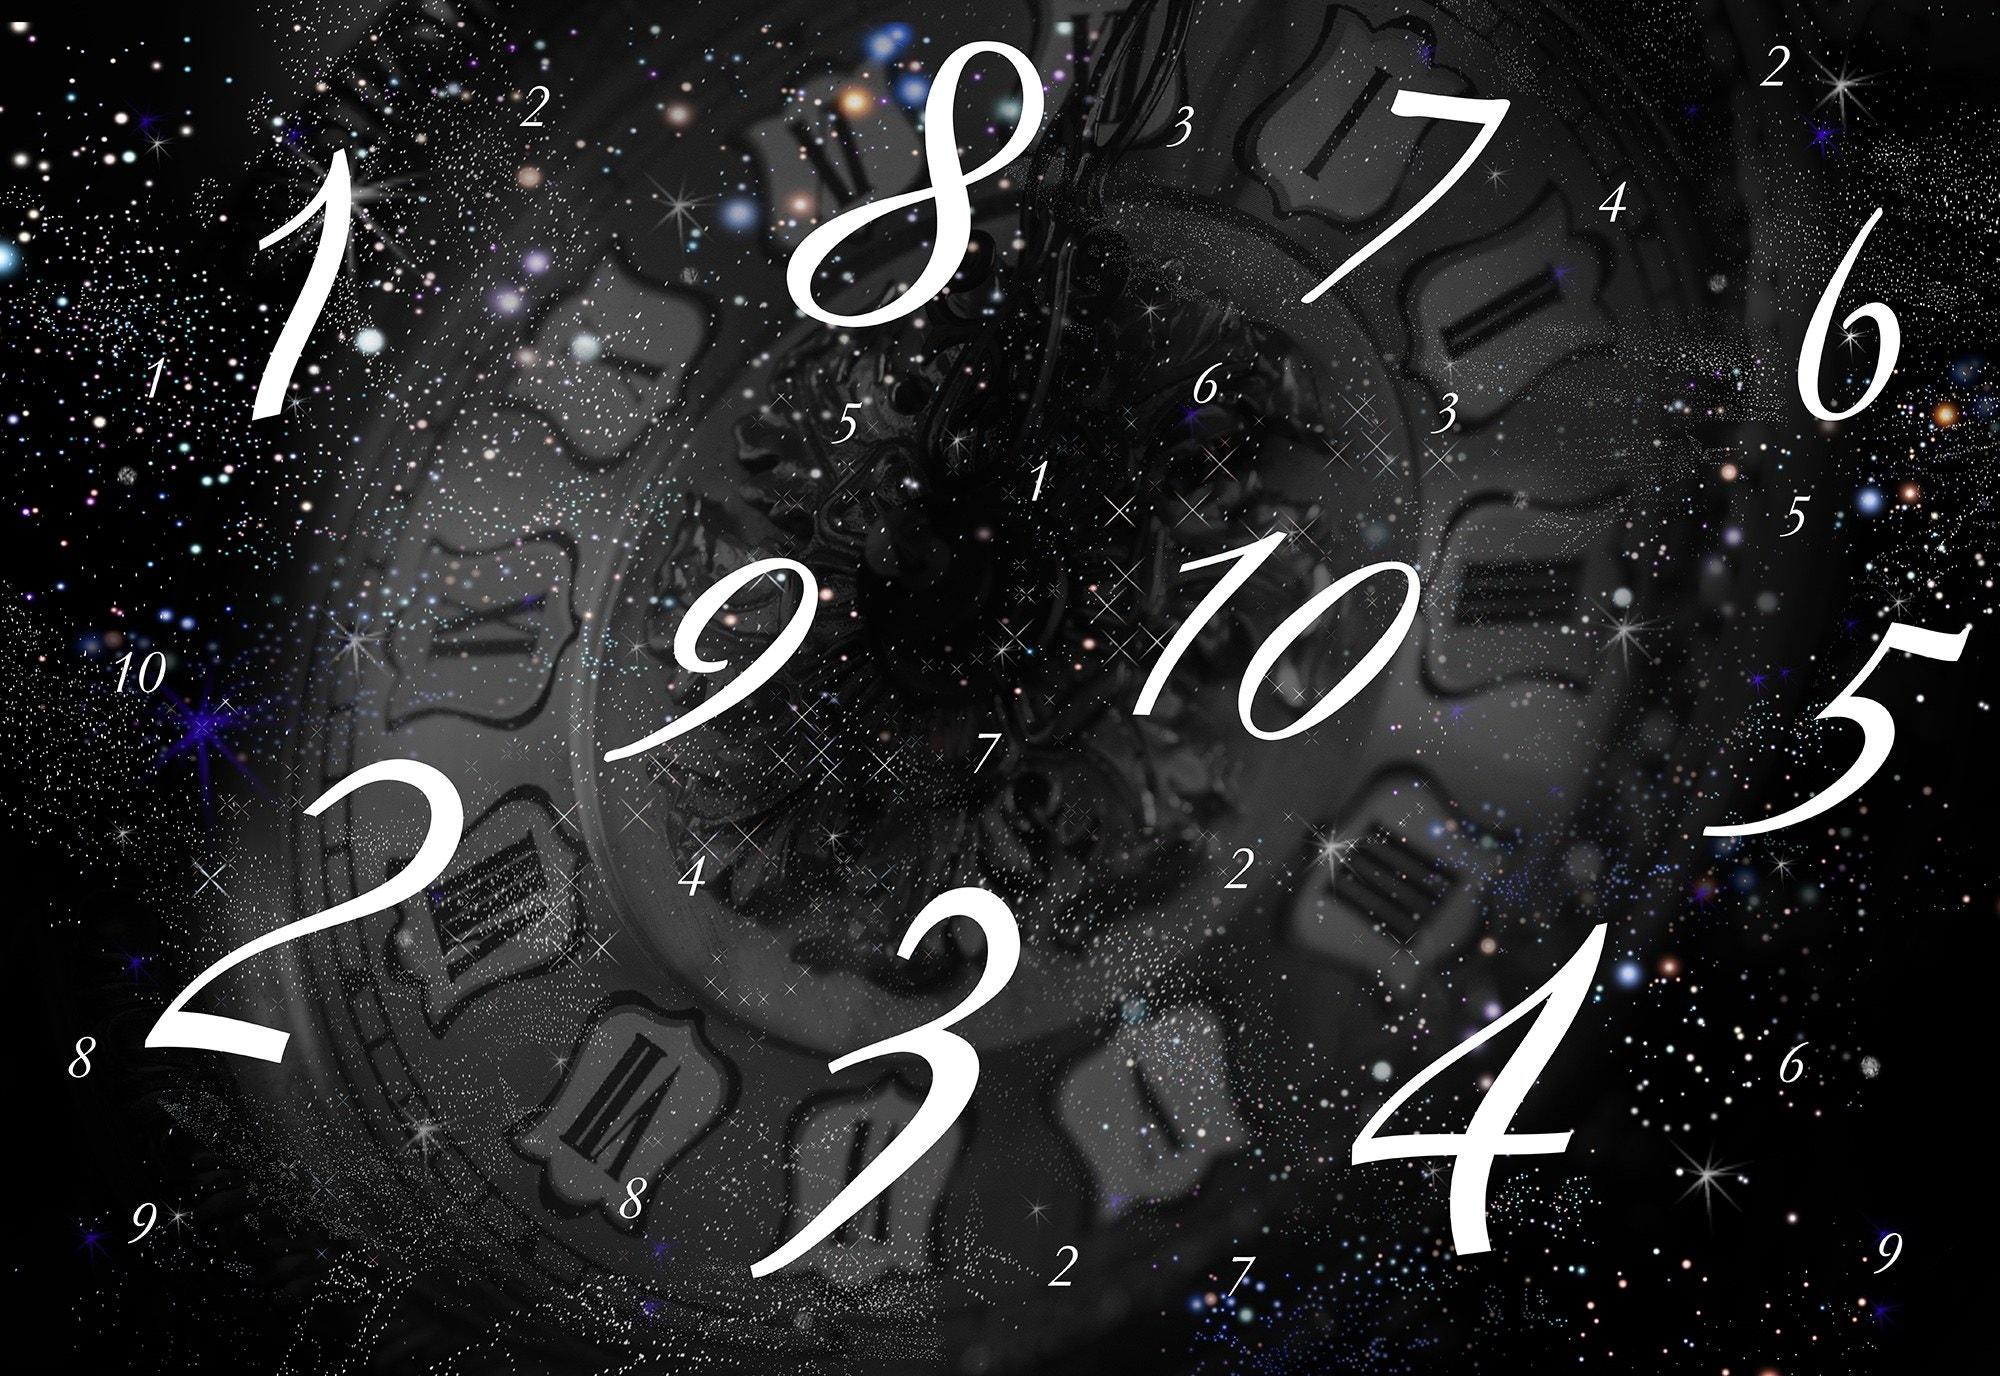 numerology-interpret-your-license-plate